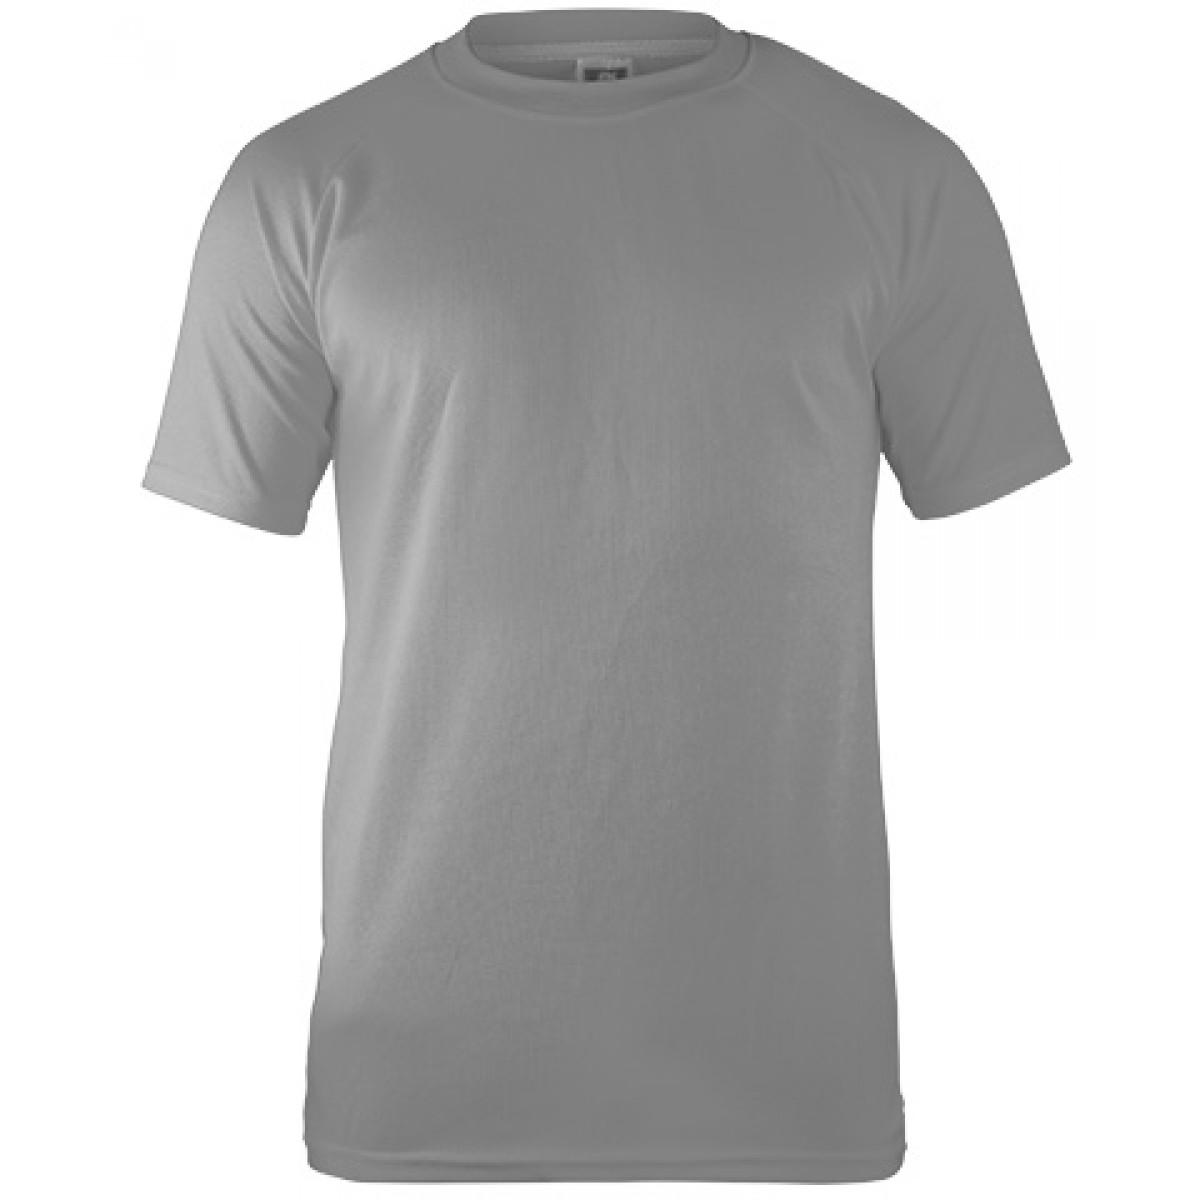 Performance T-shirt-Gray -XL